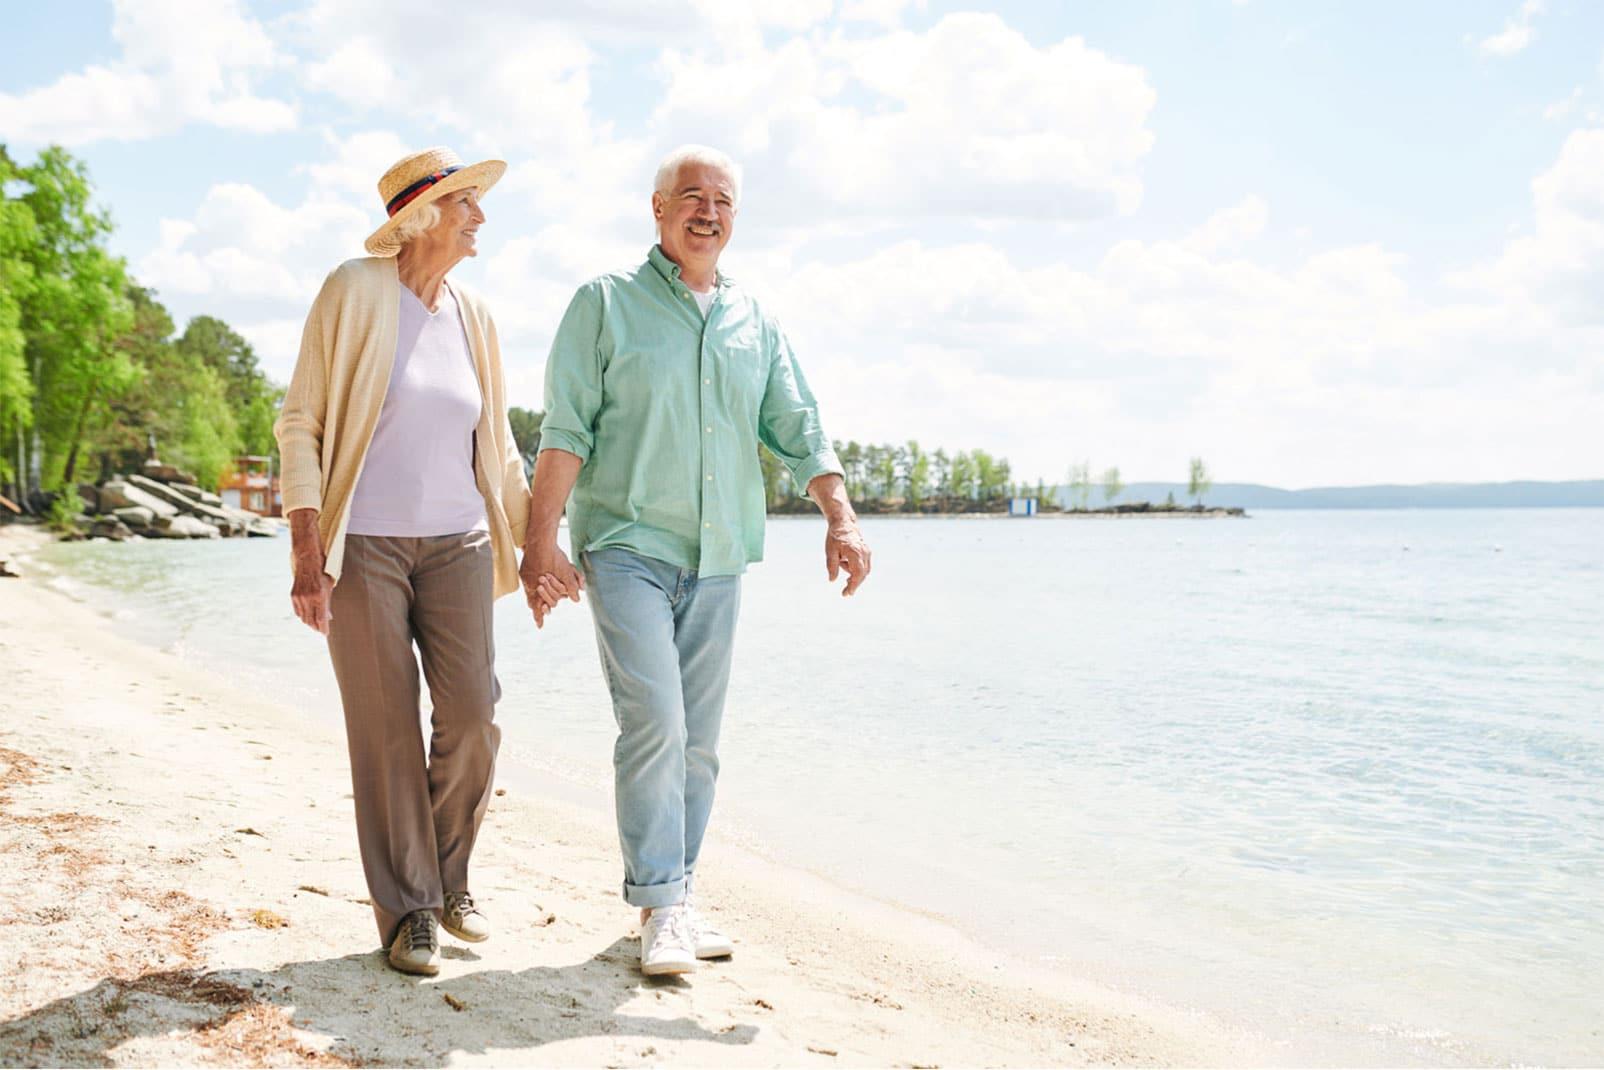 Älteres Paar im Urlaub beim Strandpaziergang